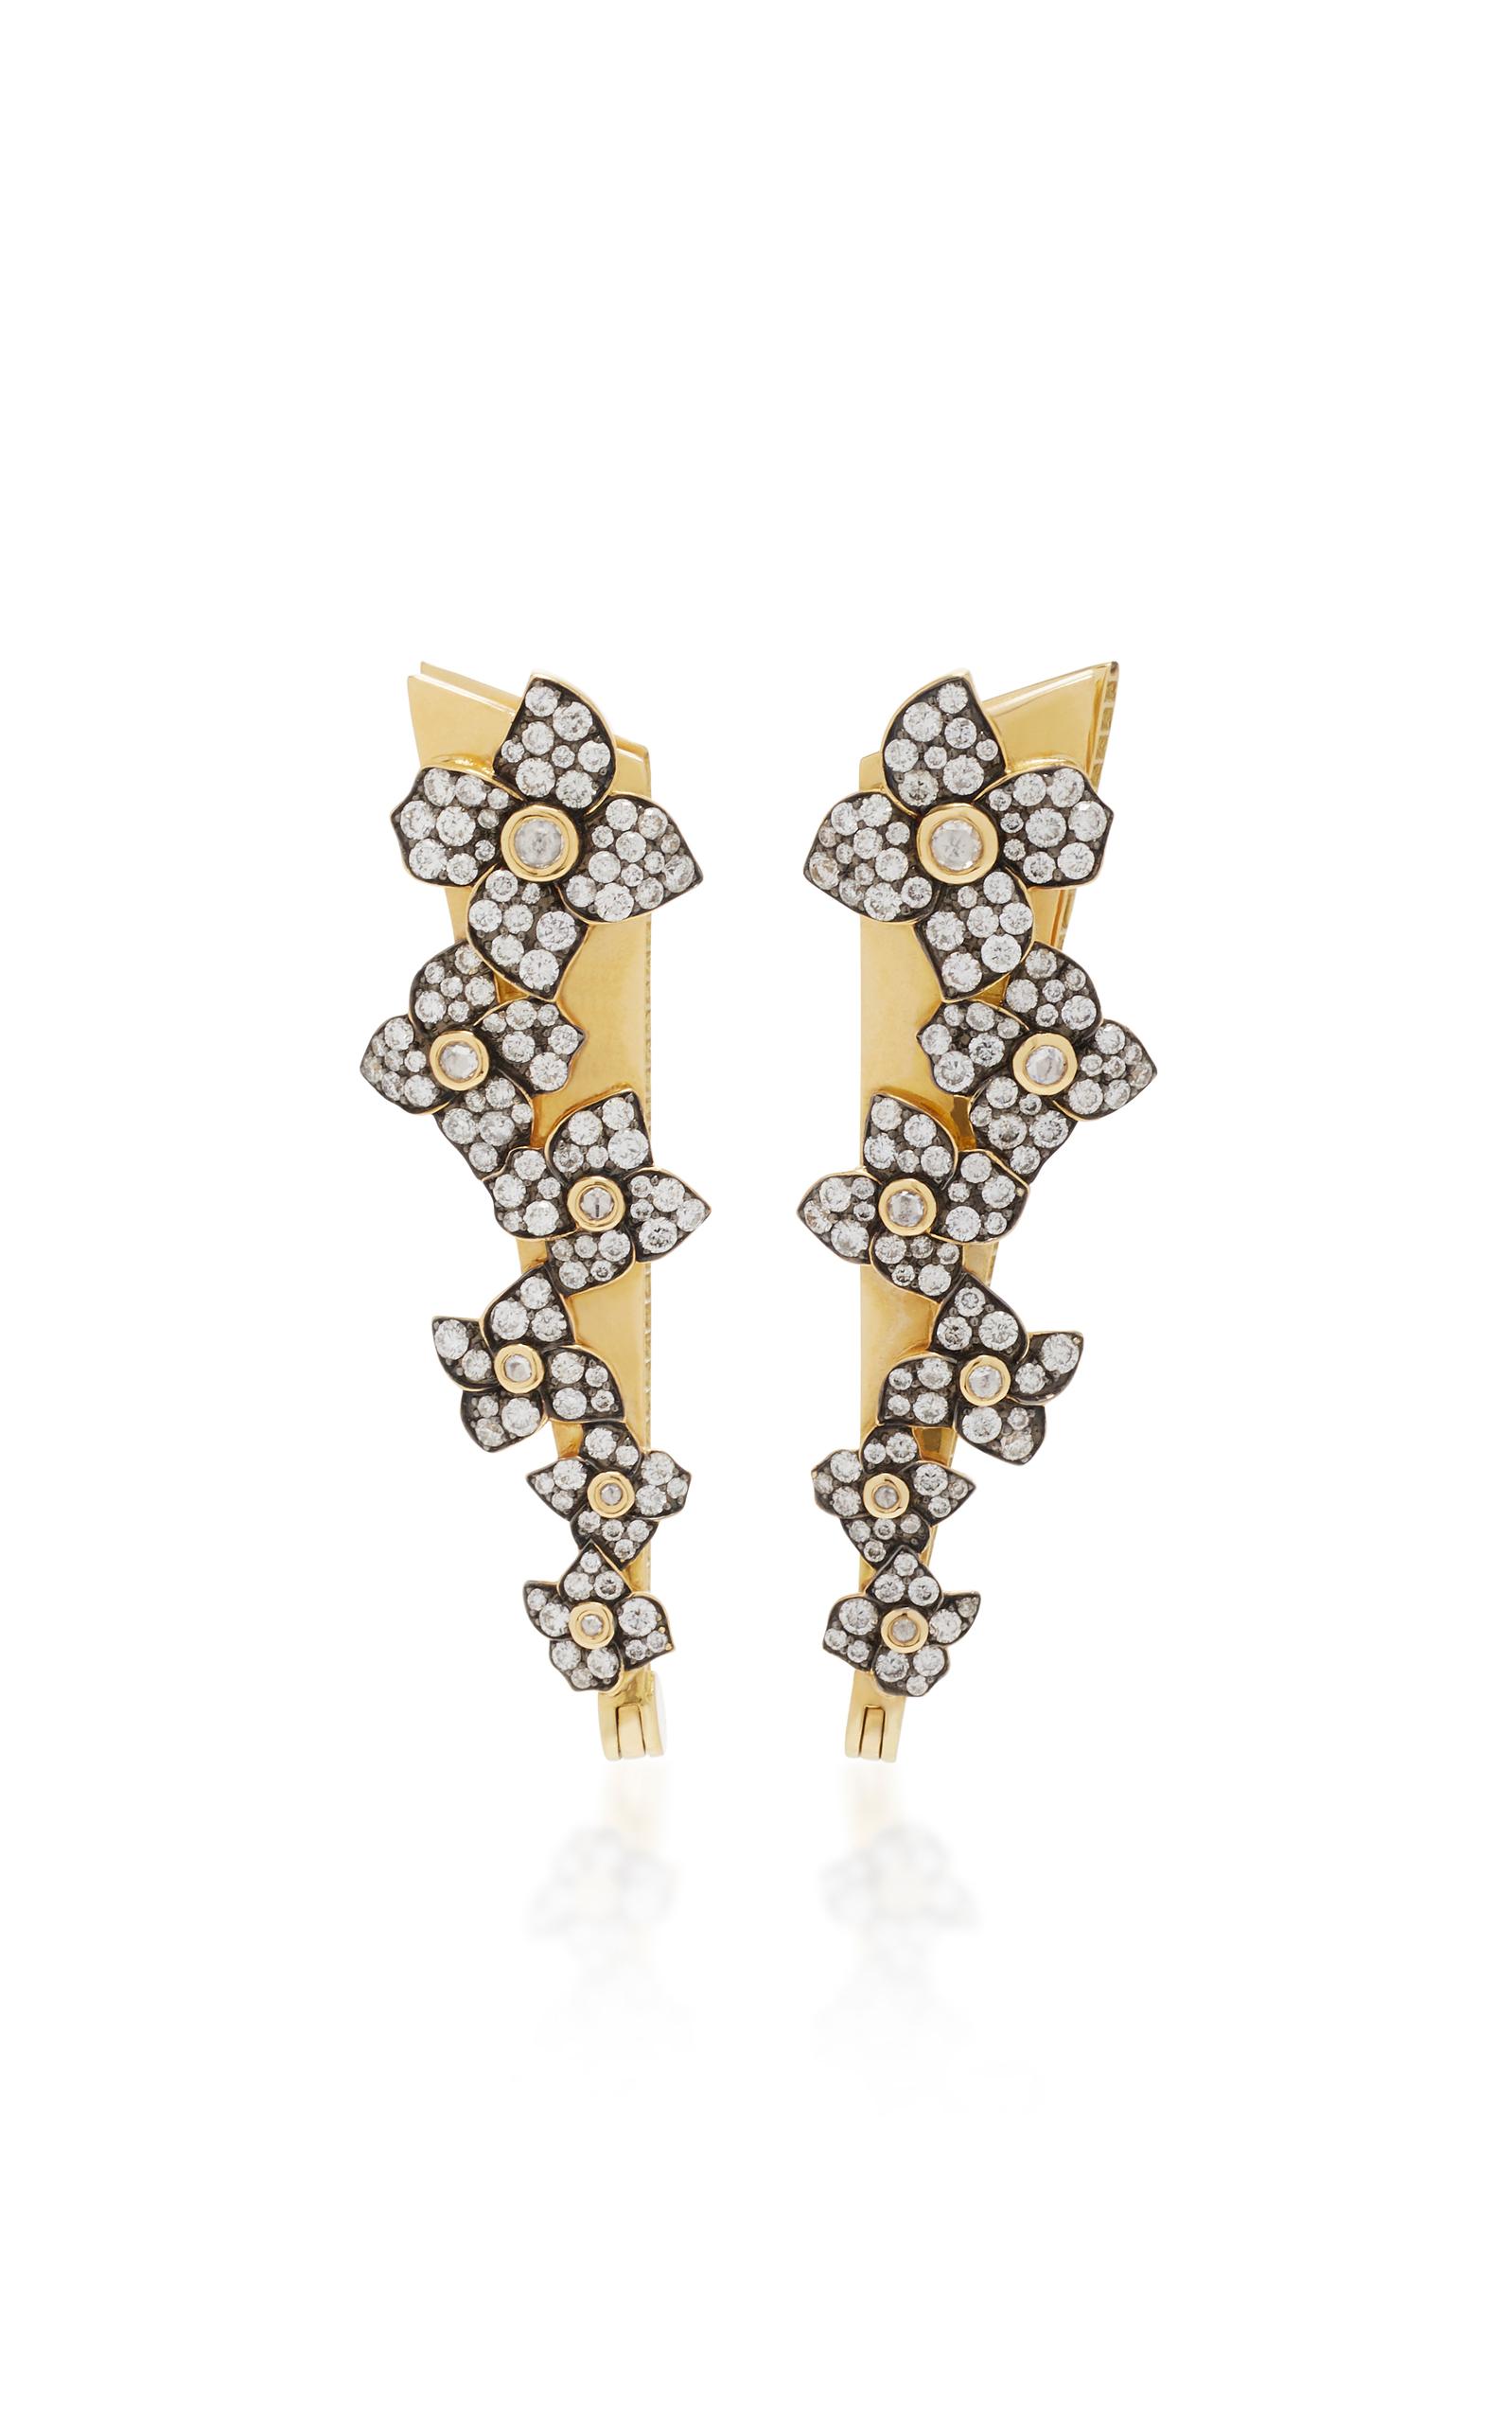 18K Gold Diamond Earrings Sorellina XnOYBwMMK